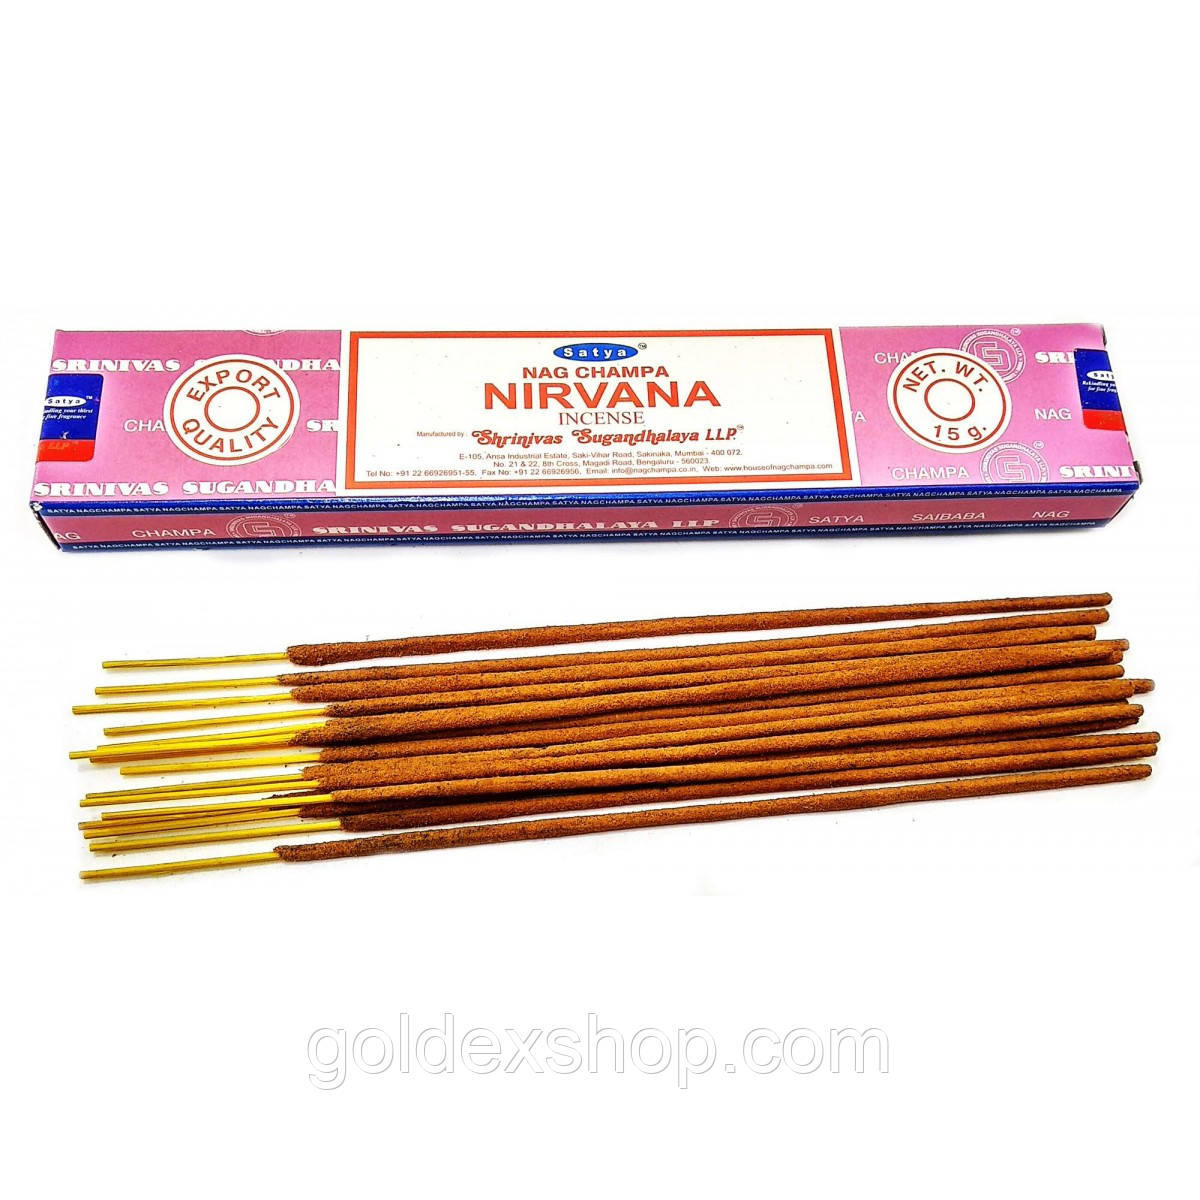 Аромапалочки Nirvana (Нирвана) (15 грамм) (Satya) Масала благовоние